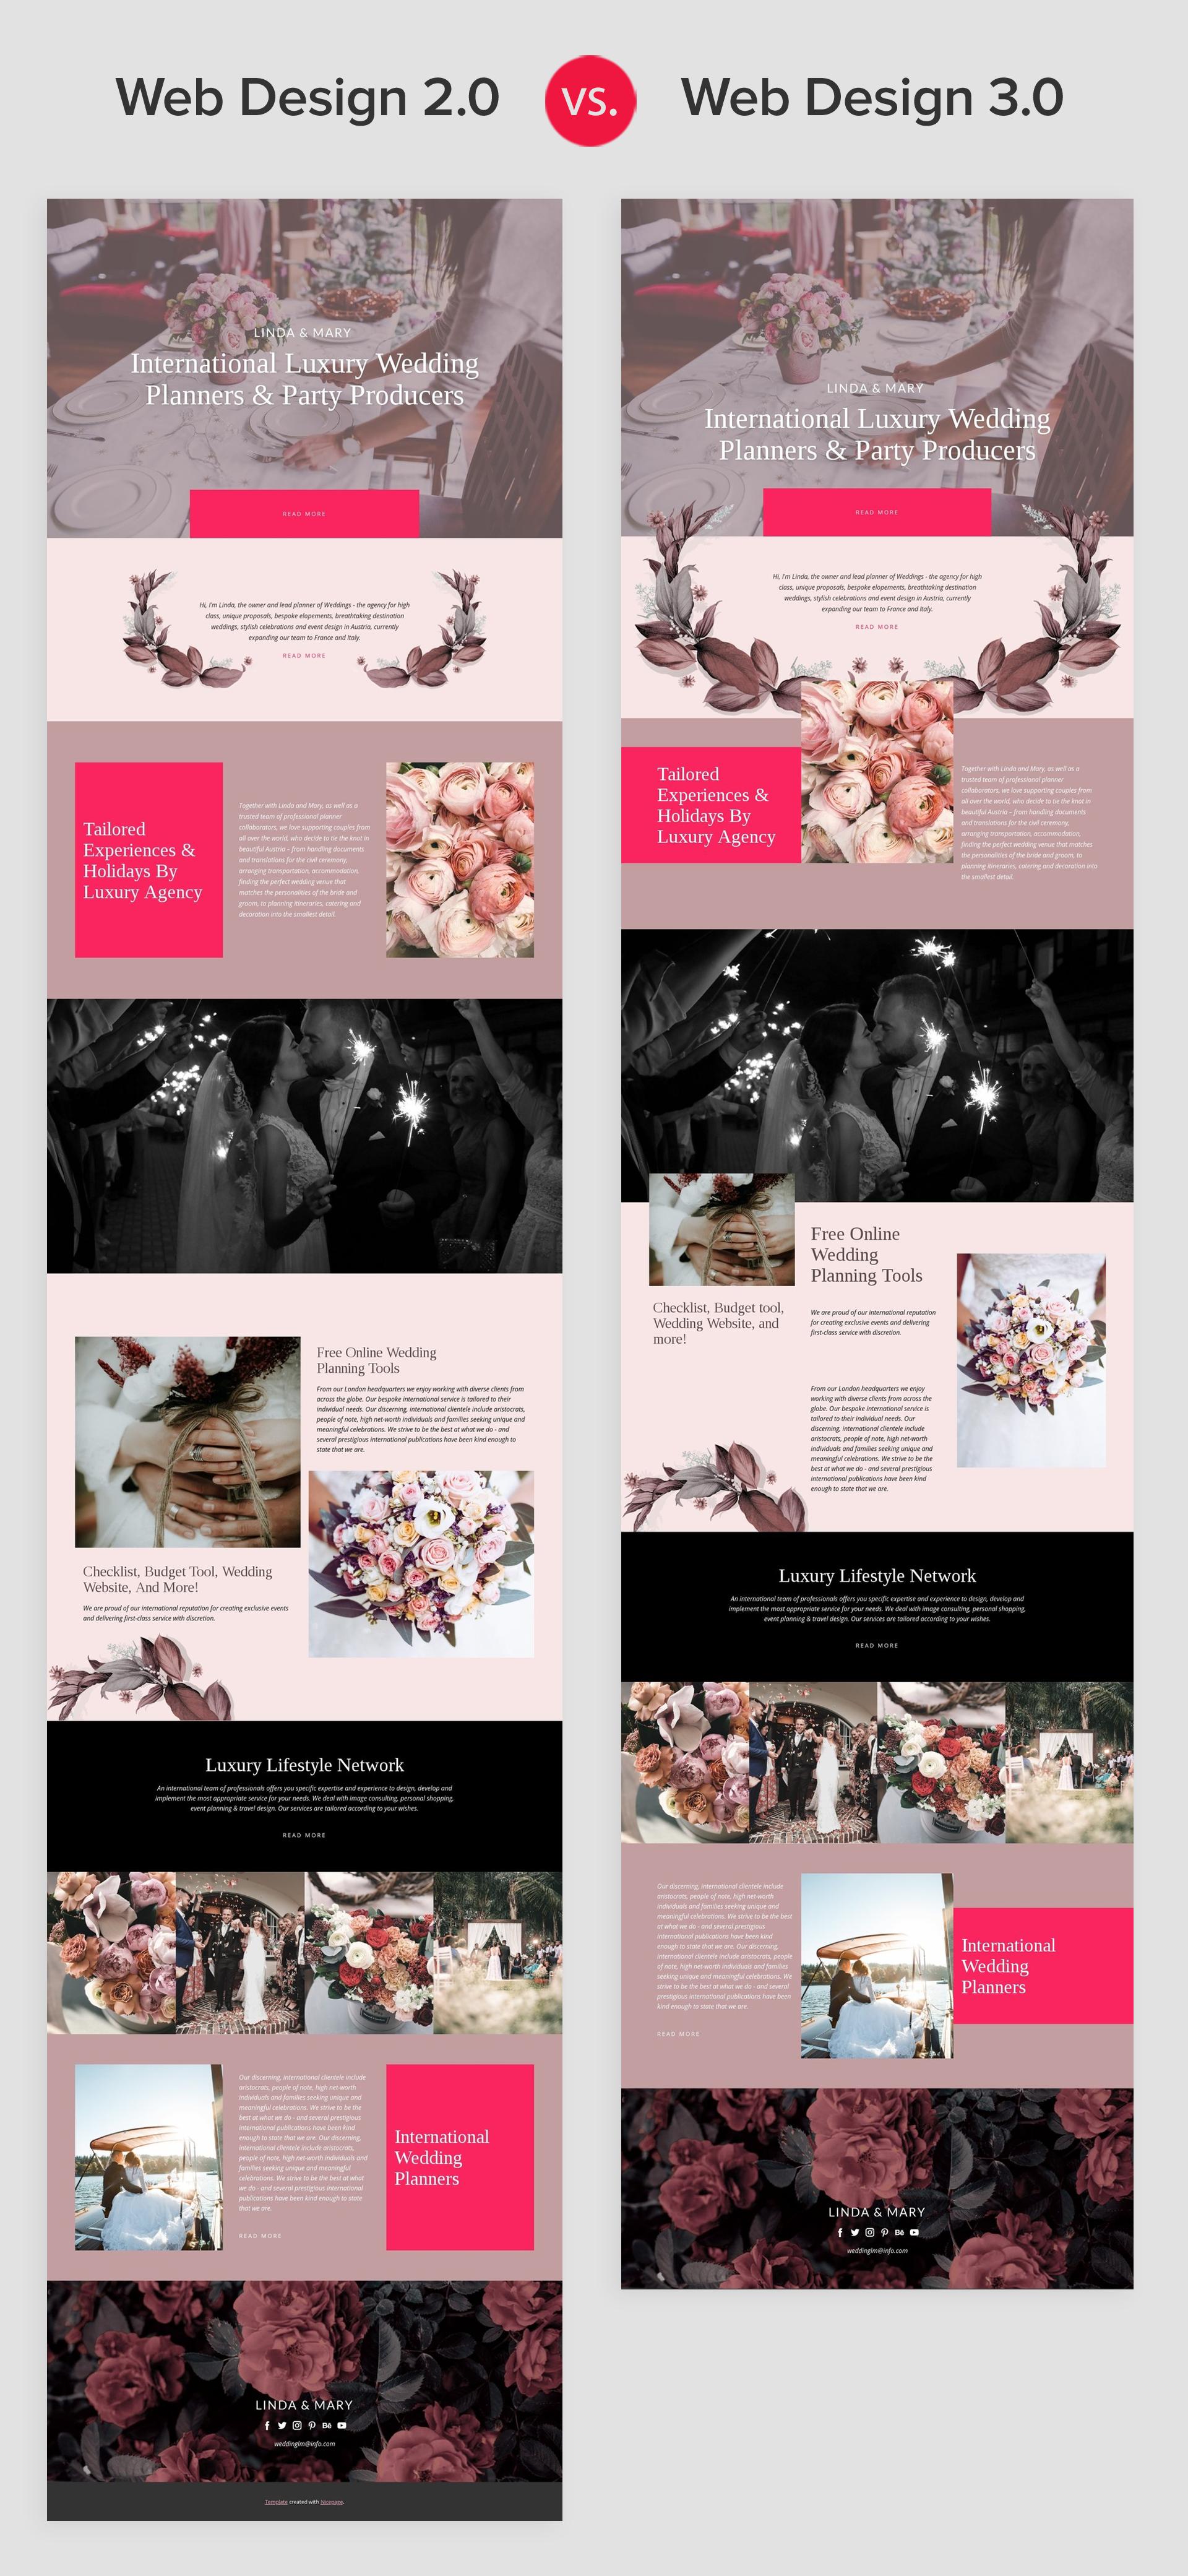 Web Design Trends Web Design Web Layout Design Web Design Trends